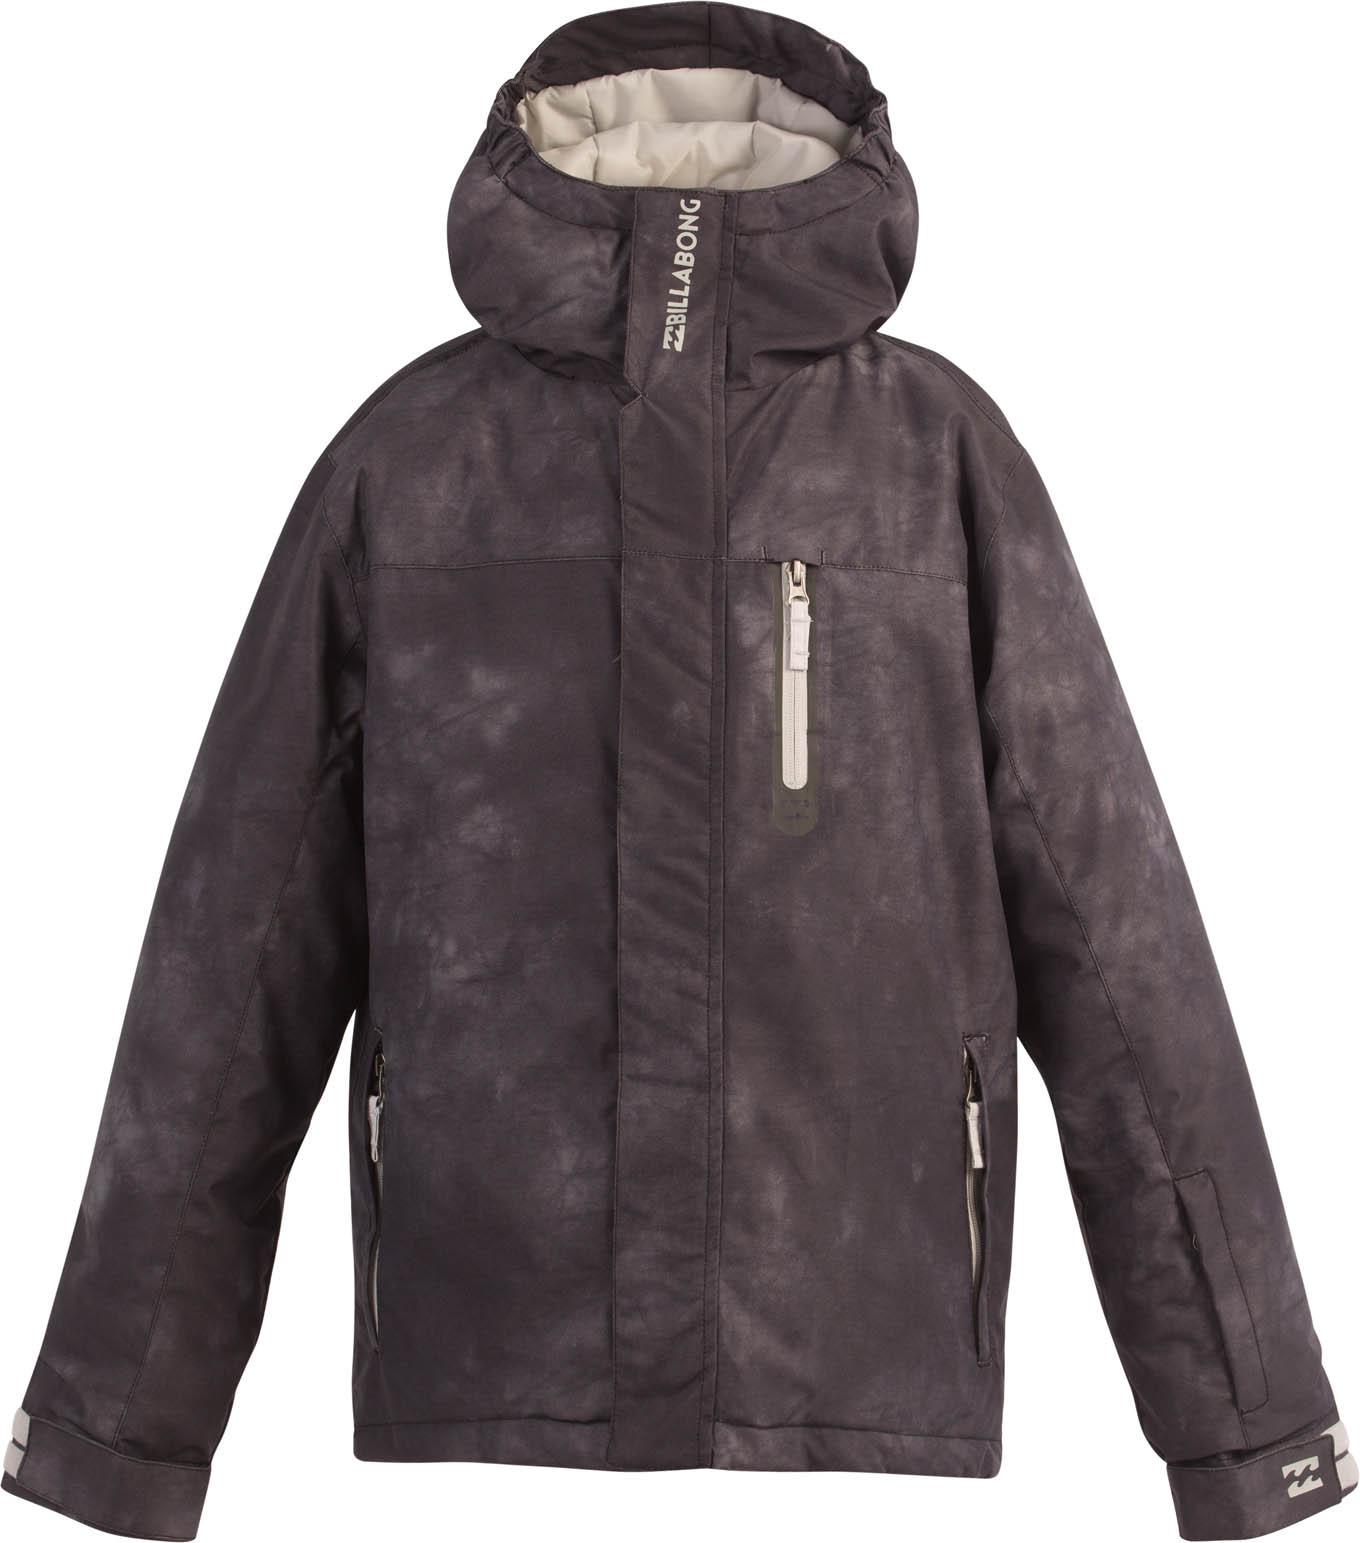 Veste ski enfant, blouson ski enfant   Snowleader - achat ski e476de2a1a8c